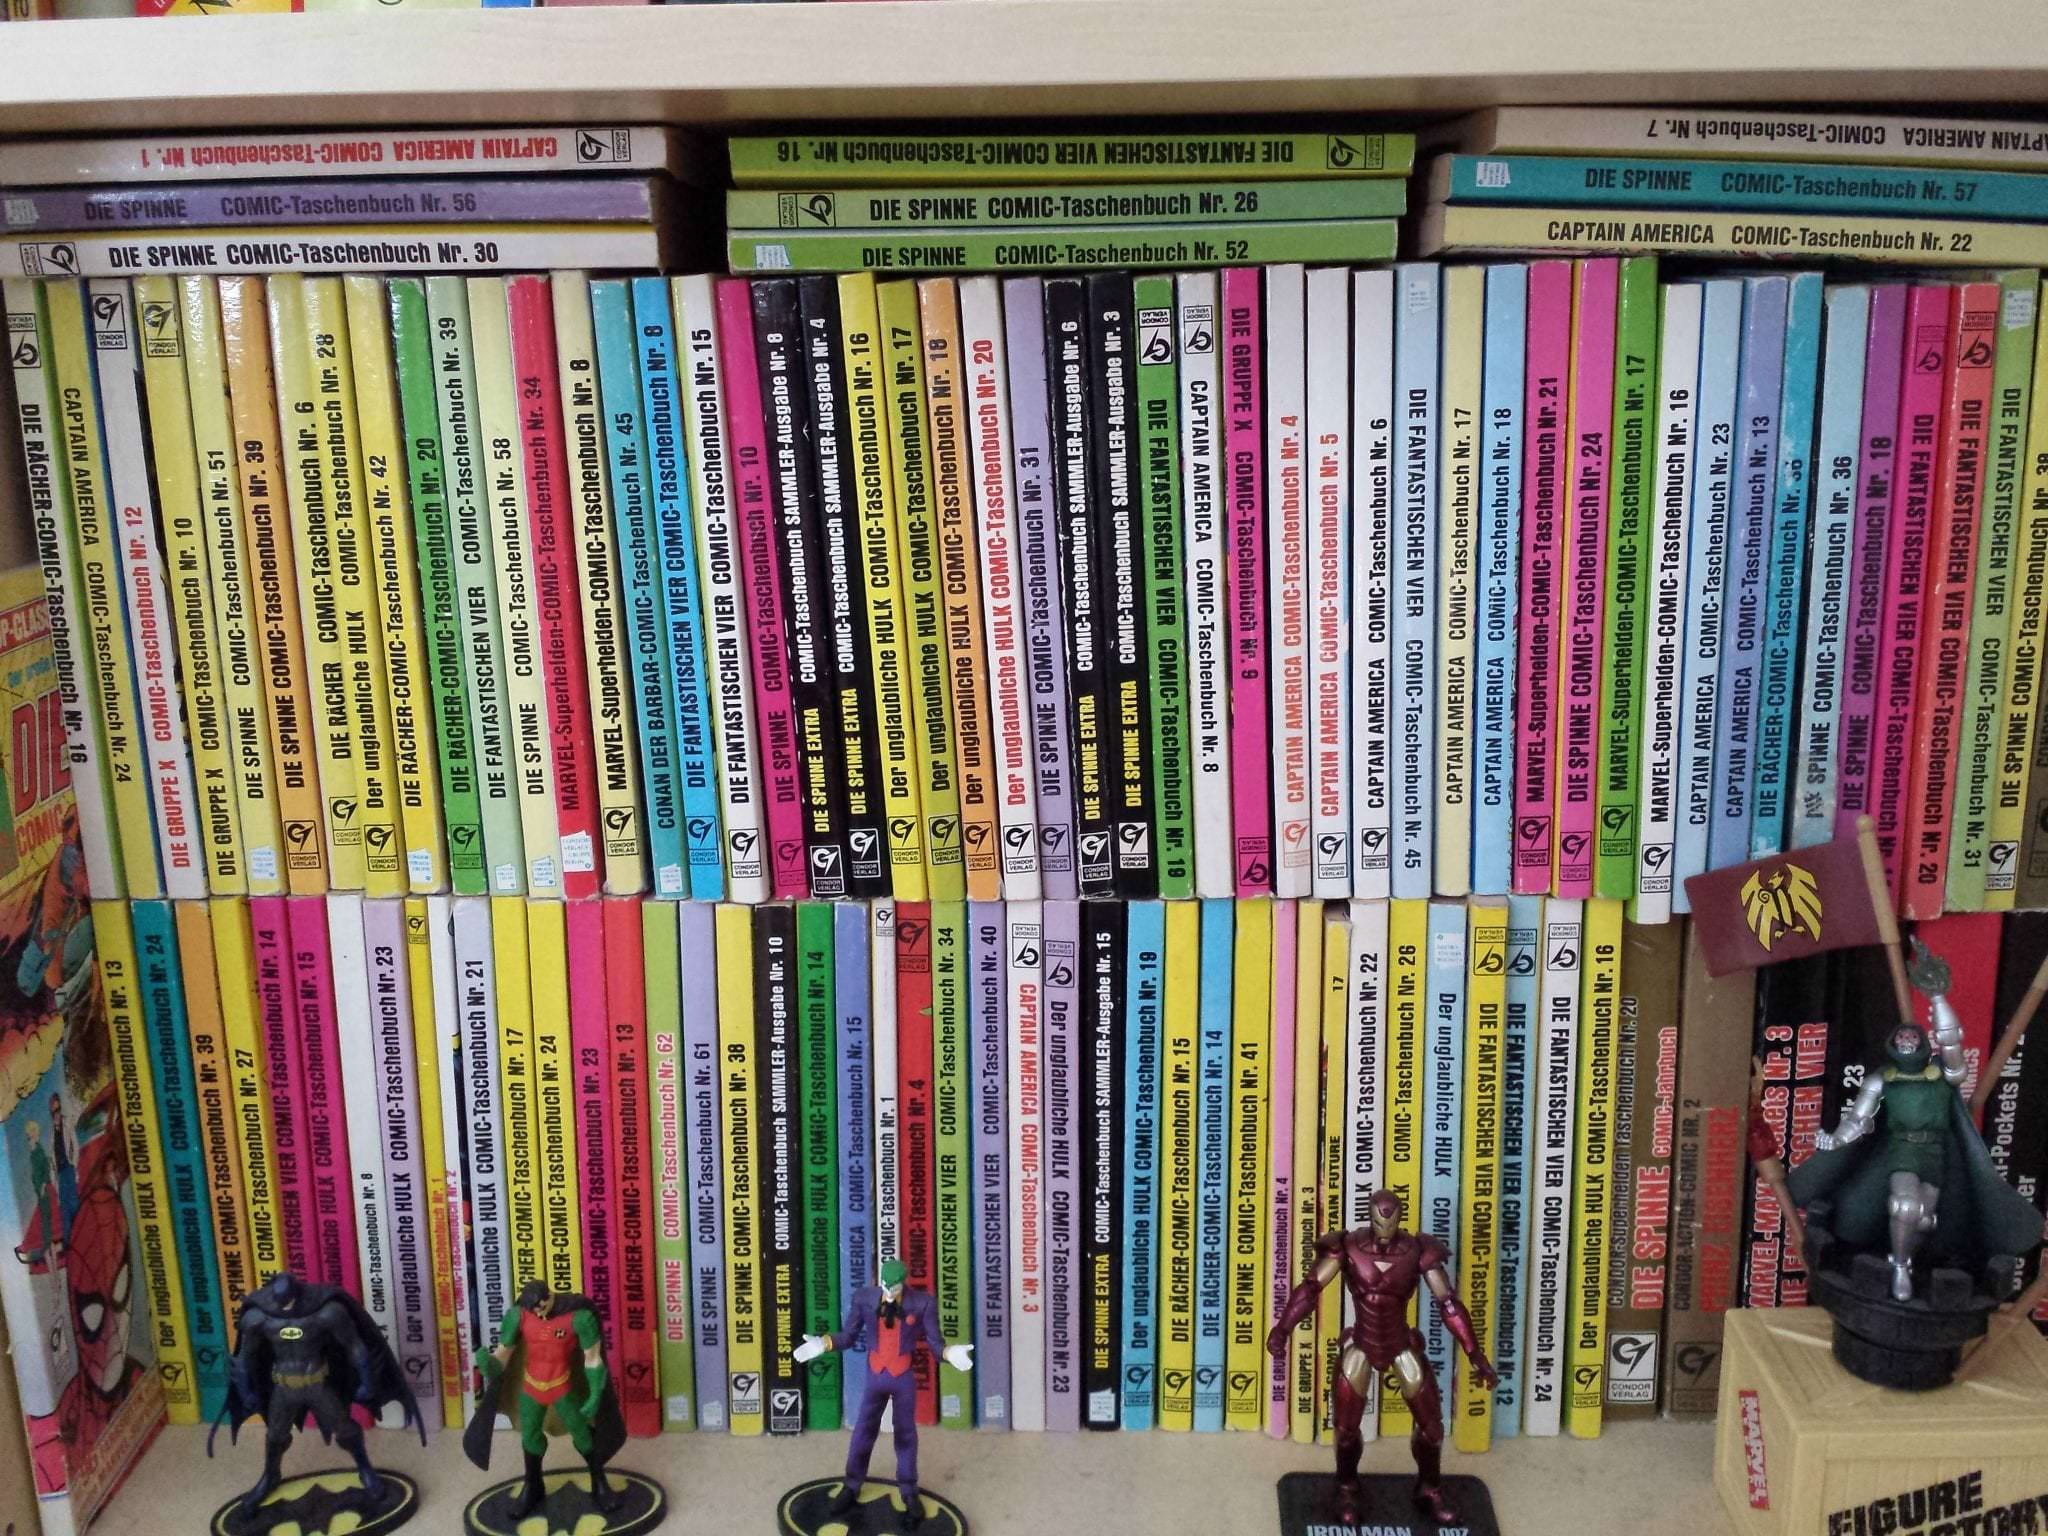 Marvel-Comicsammlung